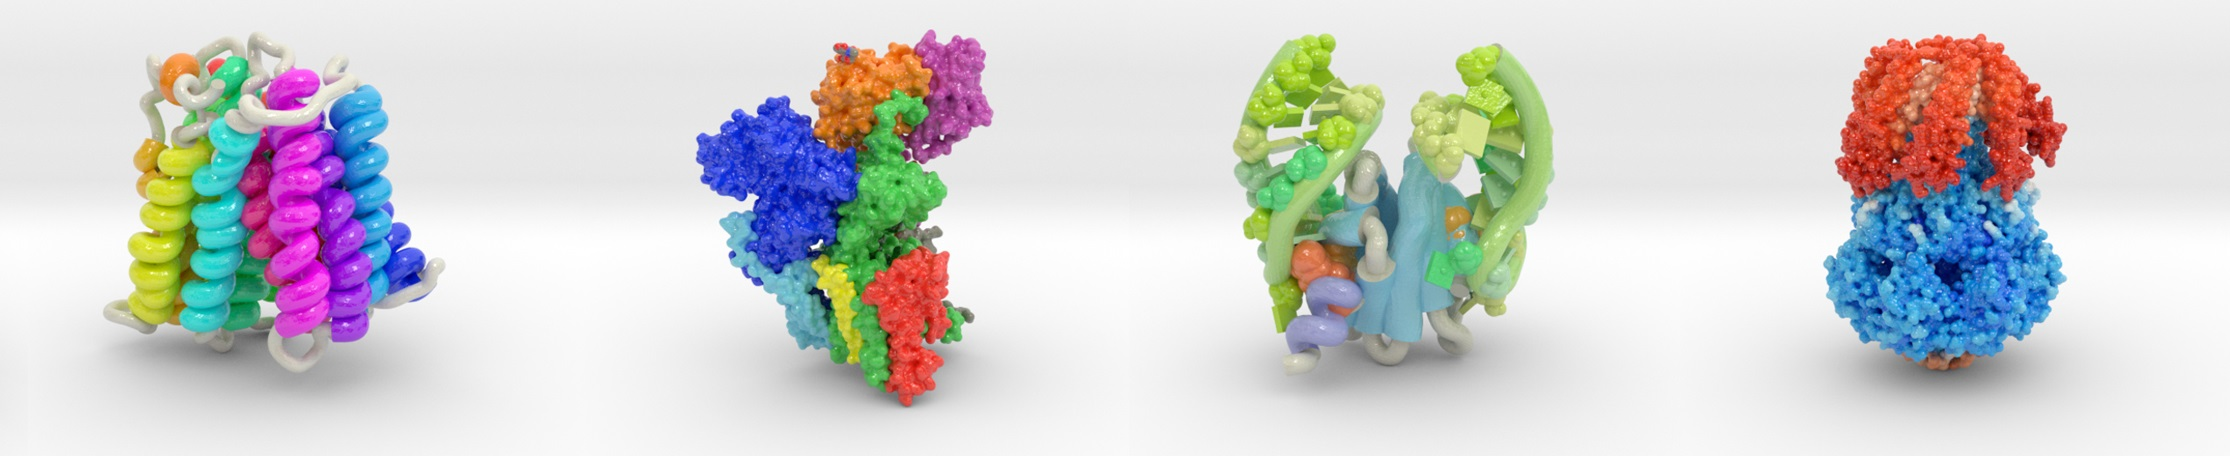 Biologic Models